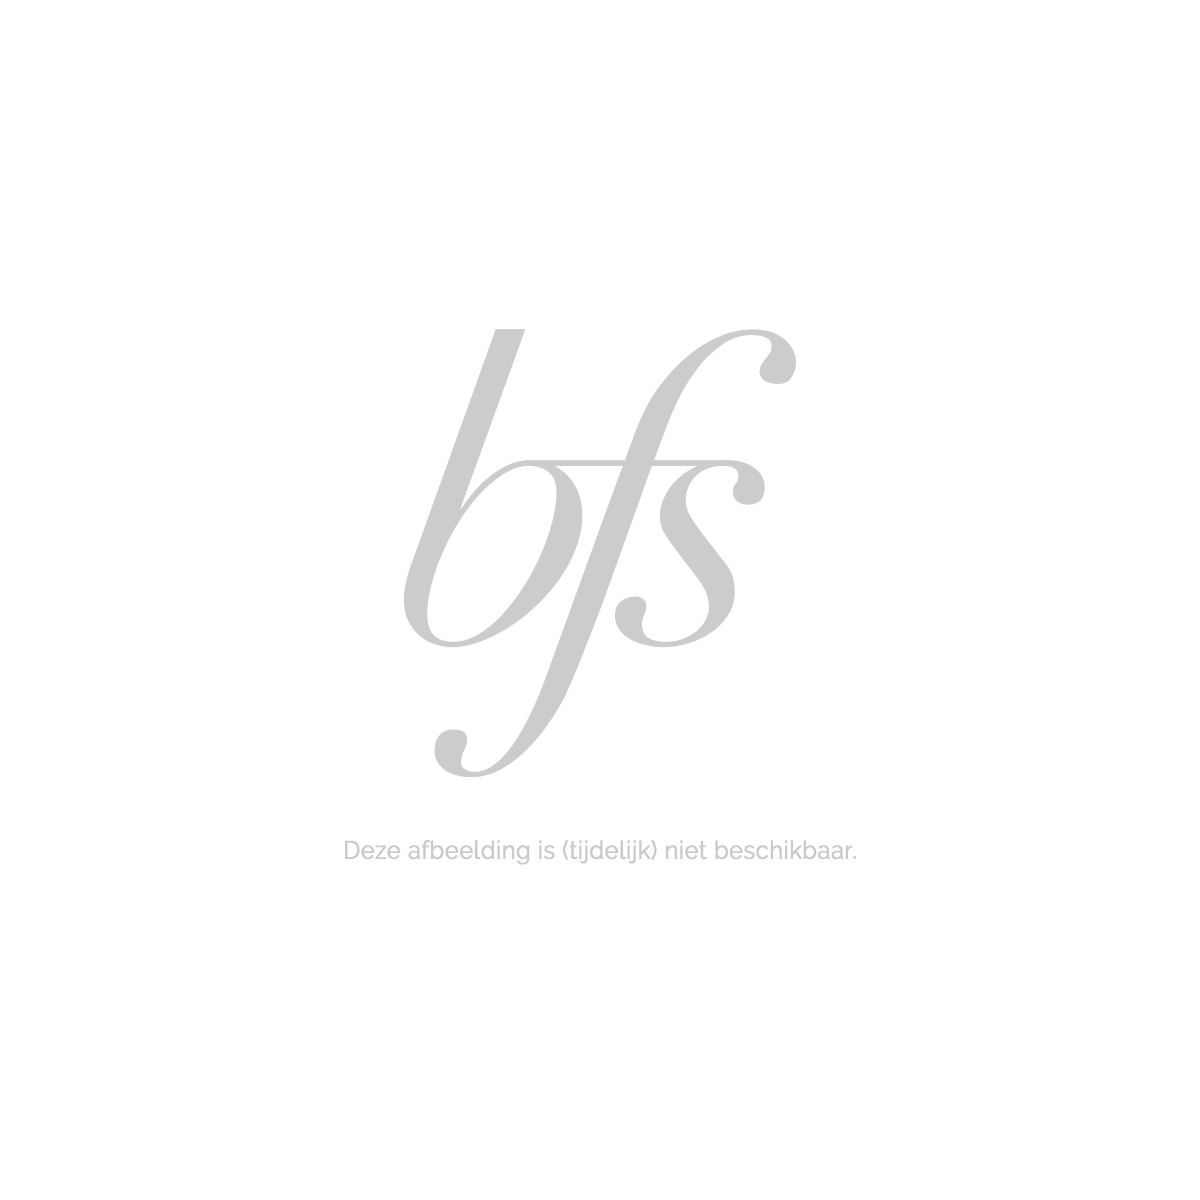 Christian Faye Brush / Stencil Set